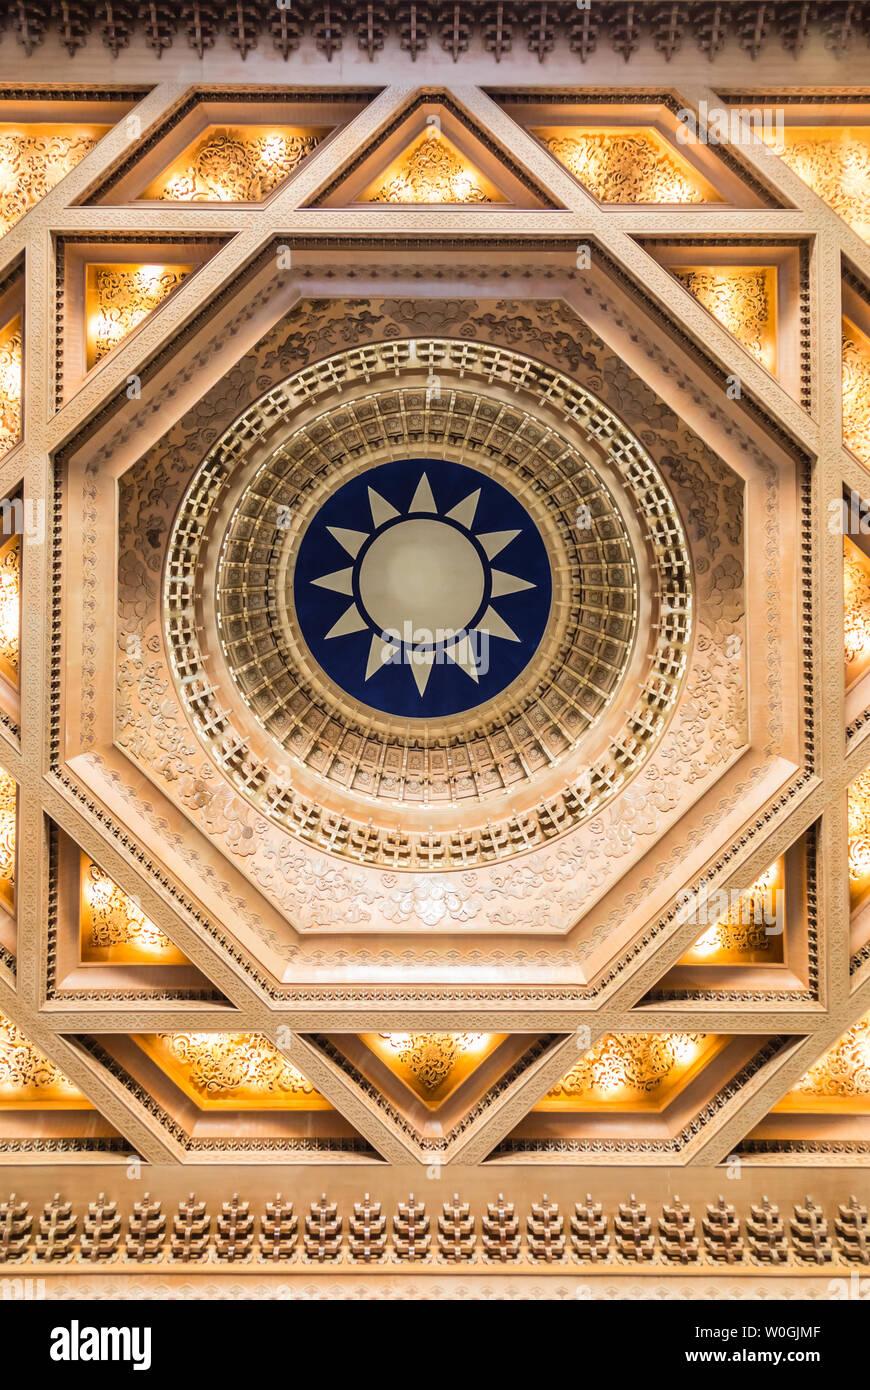 Taipei,Taiwan-05 SEP 2017:the ceiling of Chiang Kai shek Memorial Hall - Stock Image